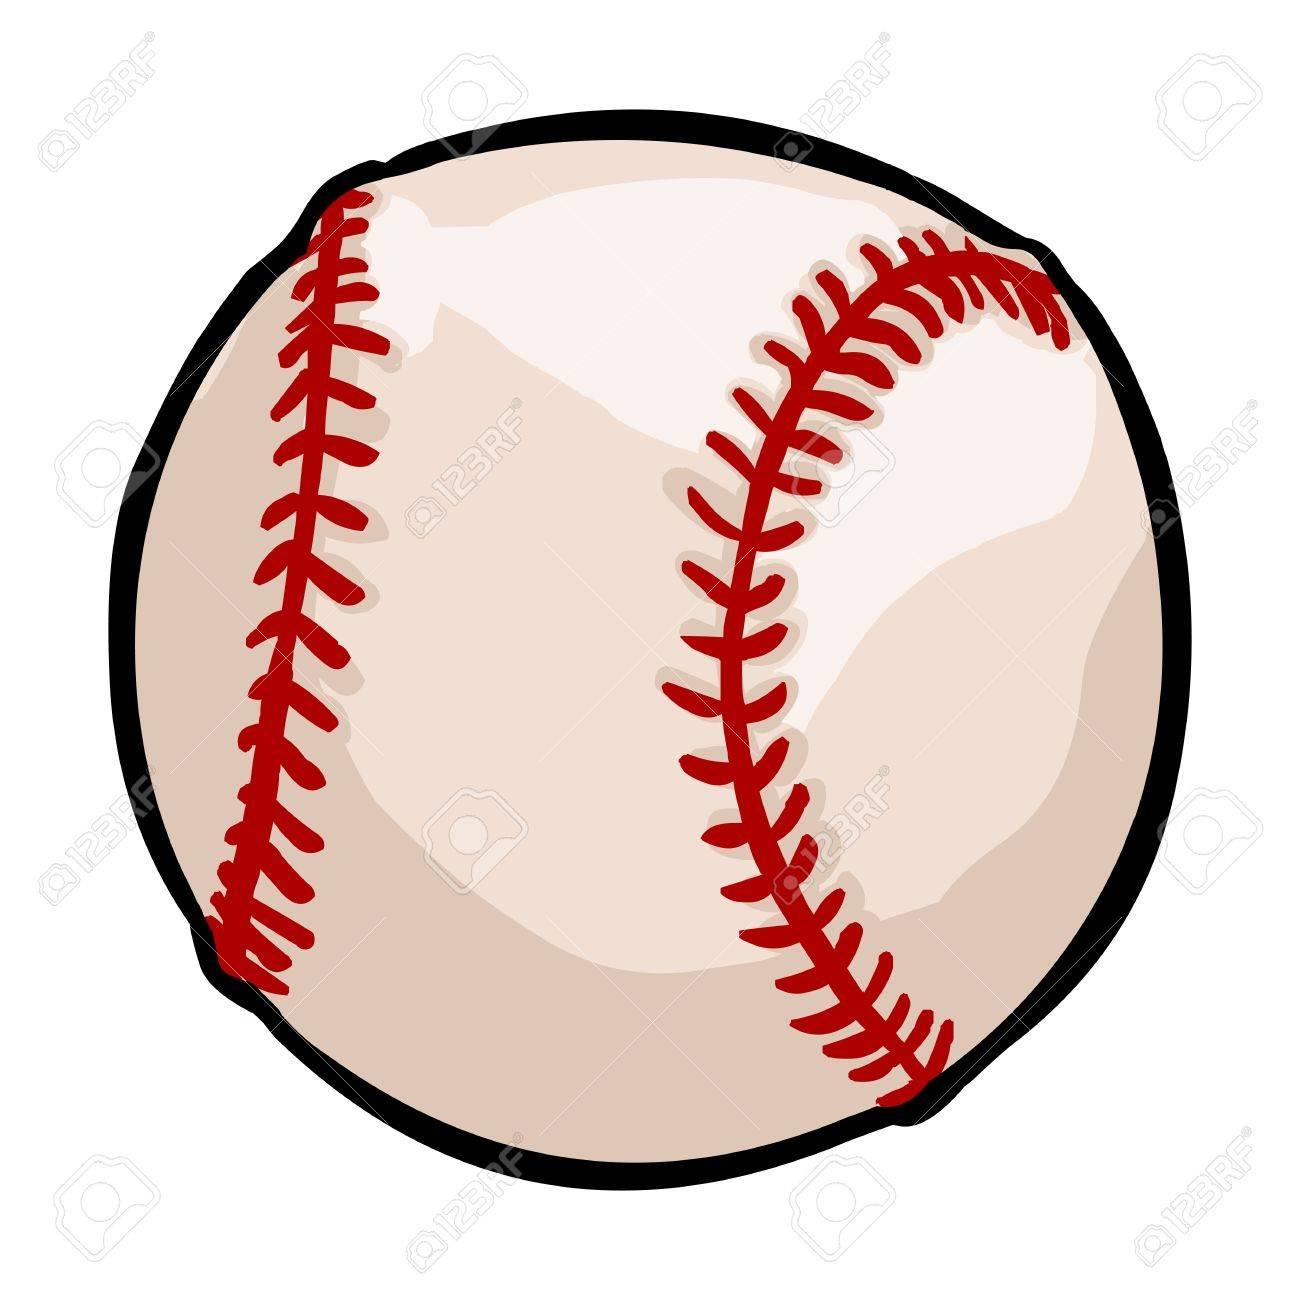 vector single cartoon baseball ball on white background royalty free rh 123rf com baseball ball clipart vector baseball ball logo vector